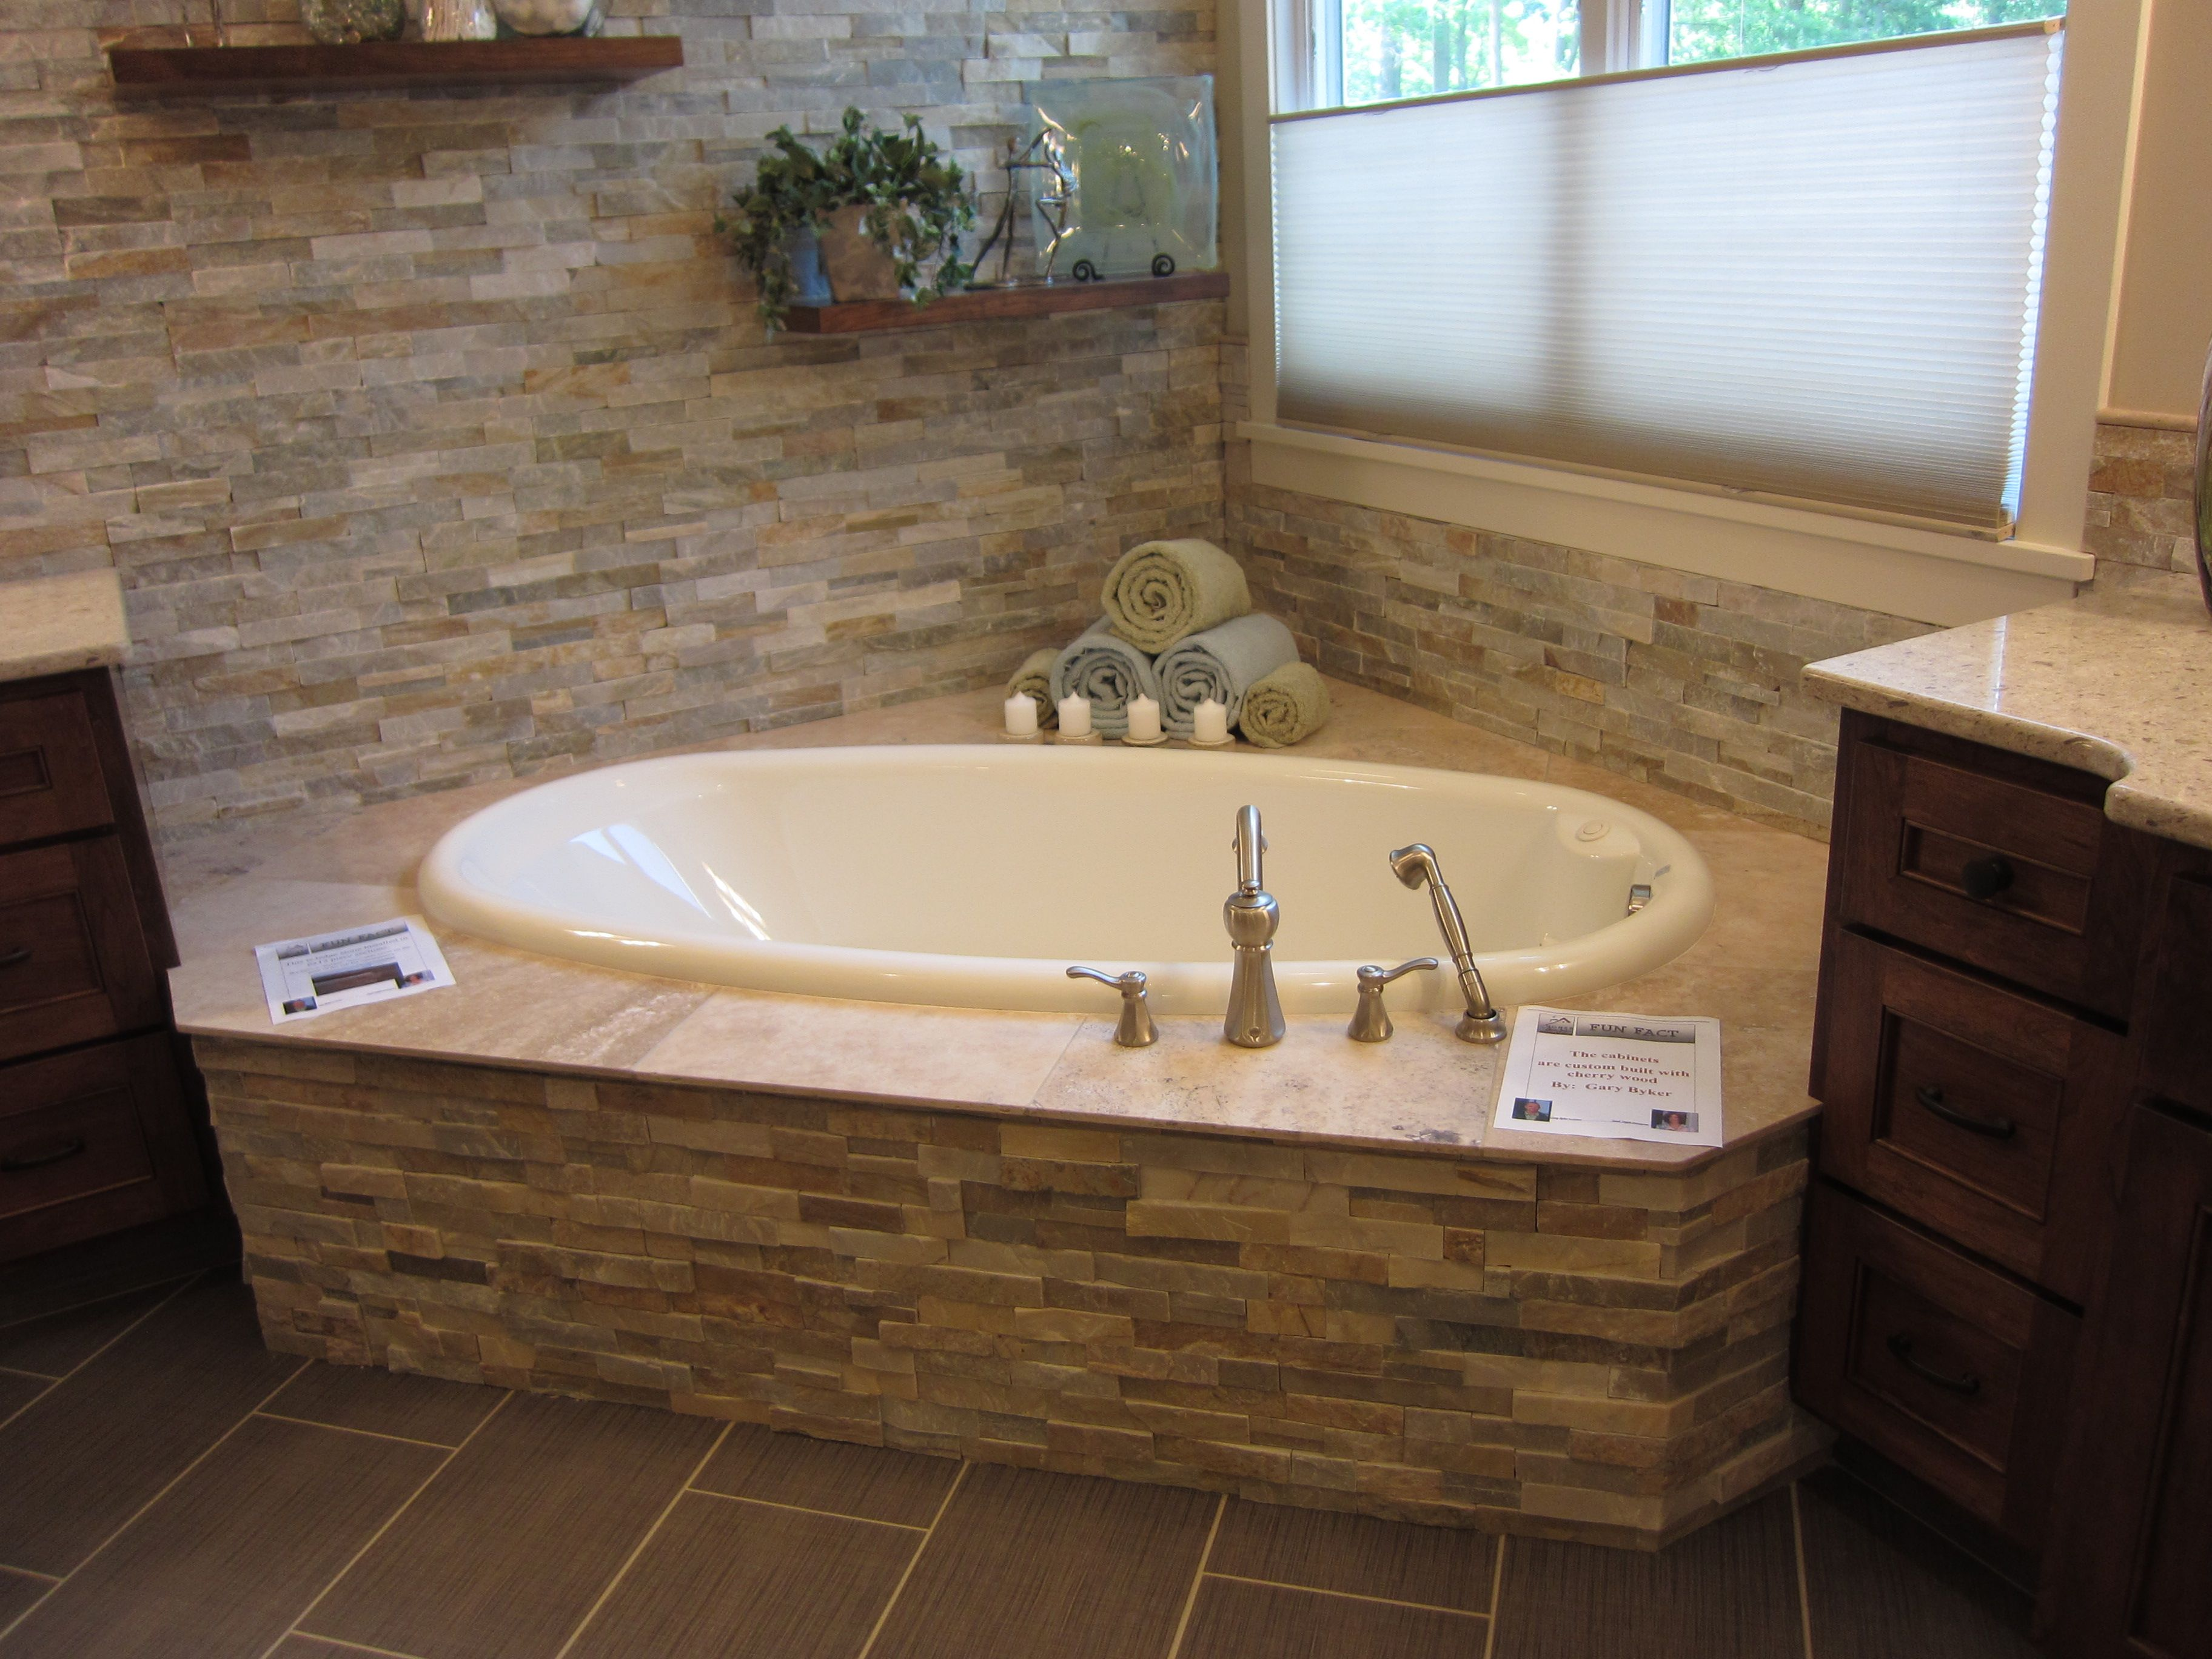 Same Stone With Whirlpool Tub Whirlpool Tub Corner Soaking Tub Jacuzzi Bathtub